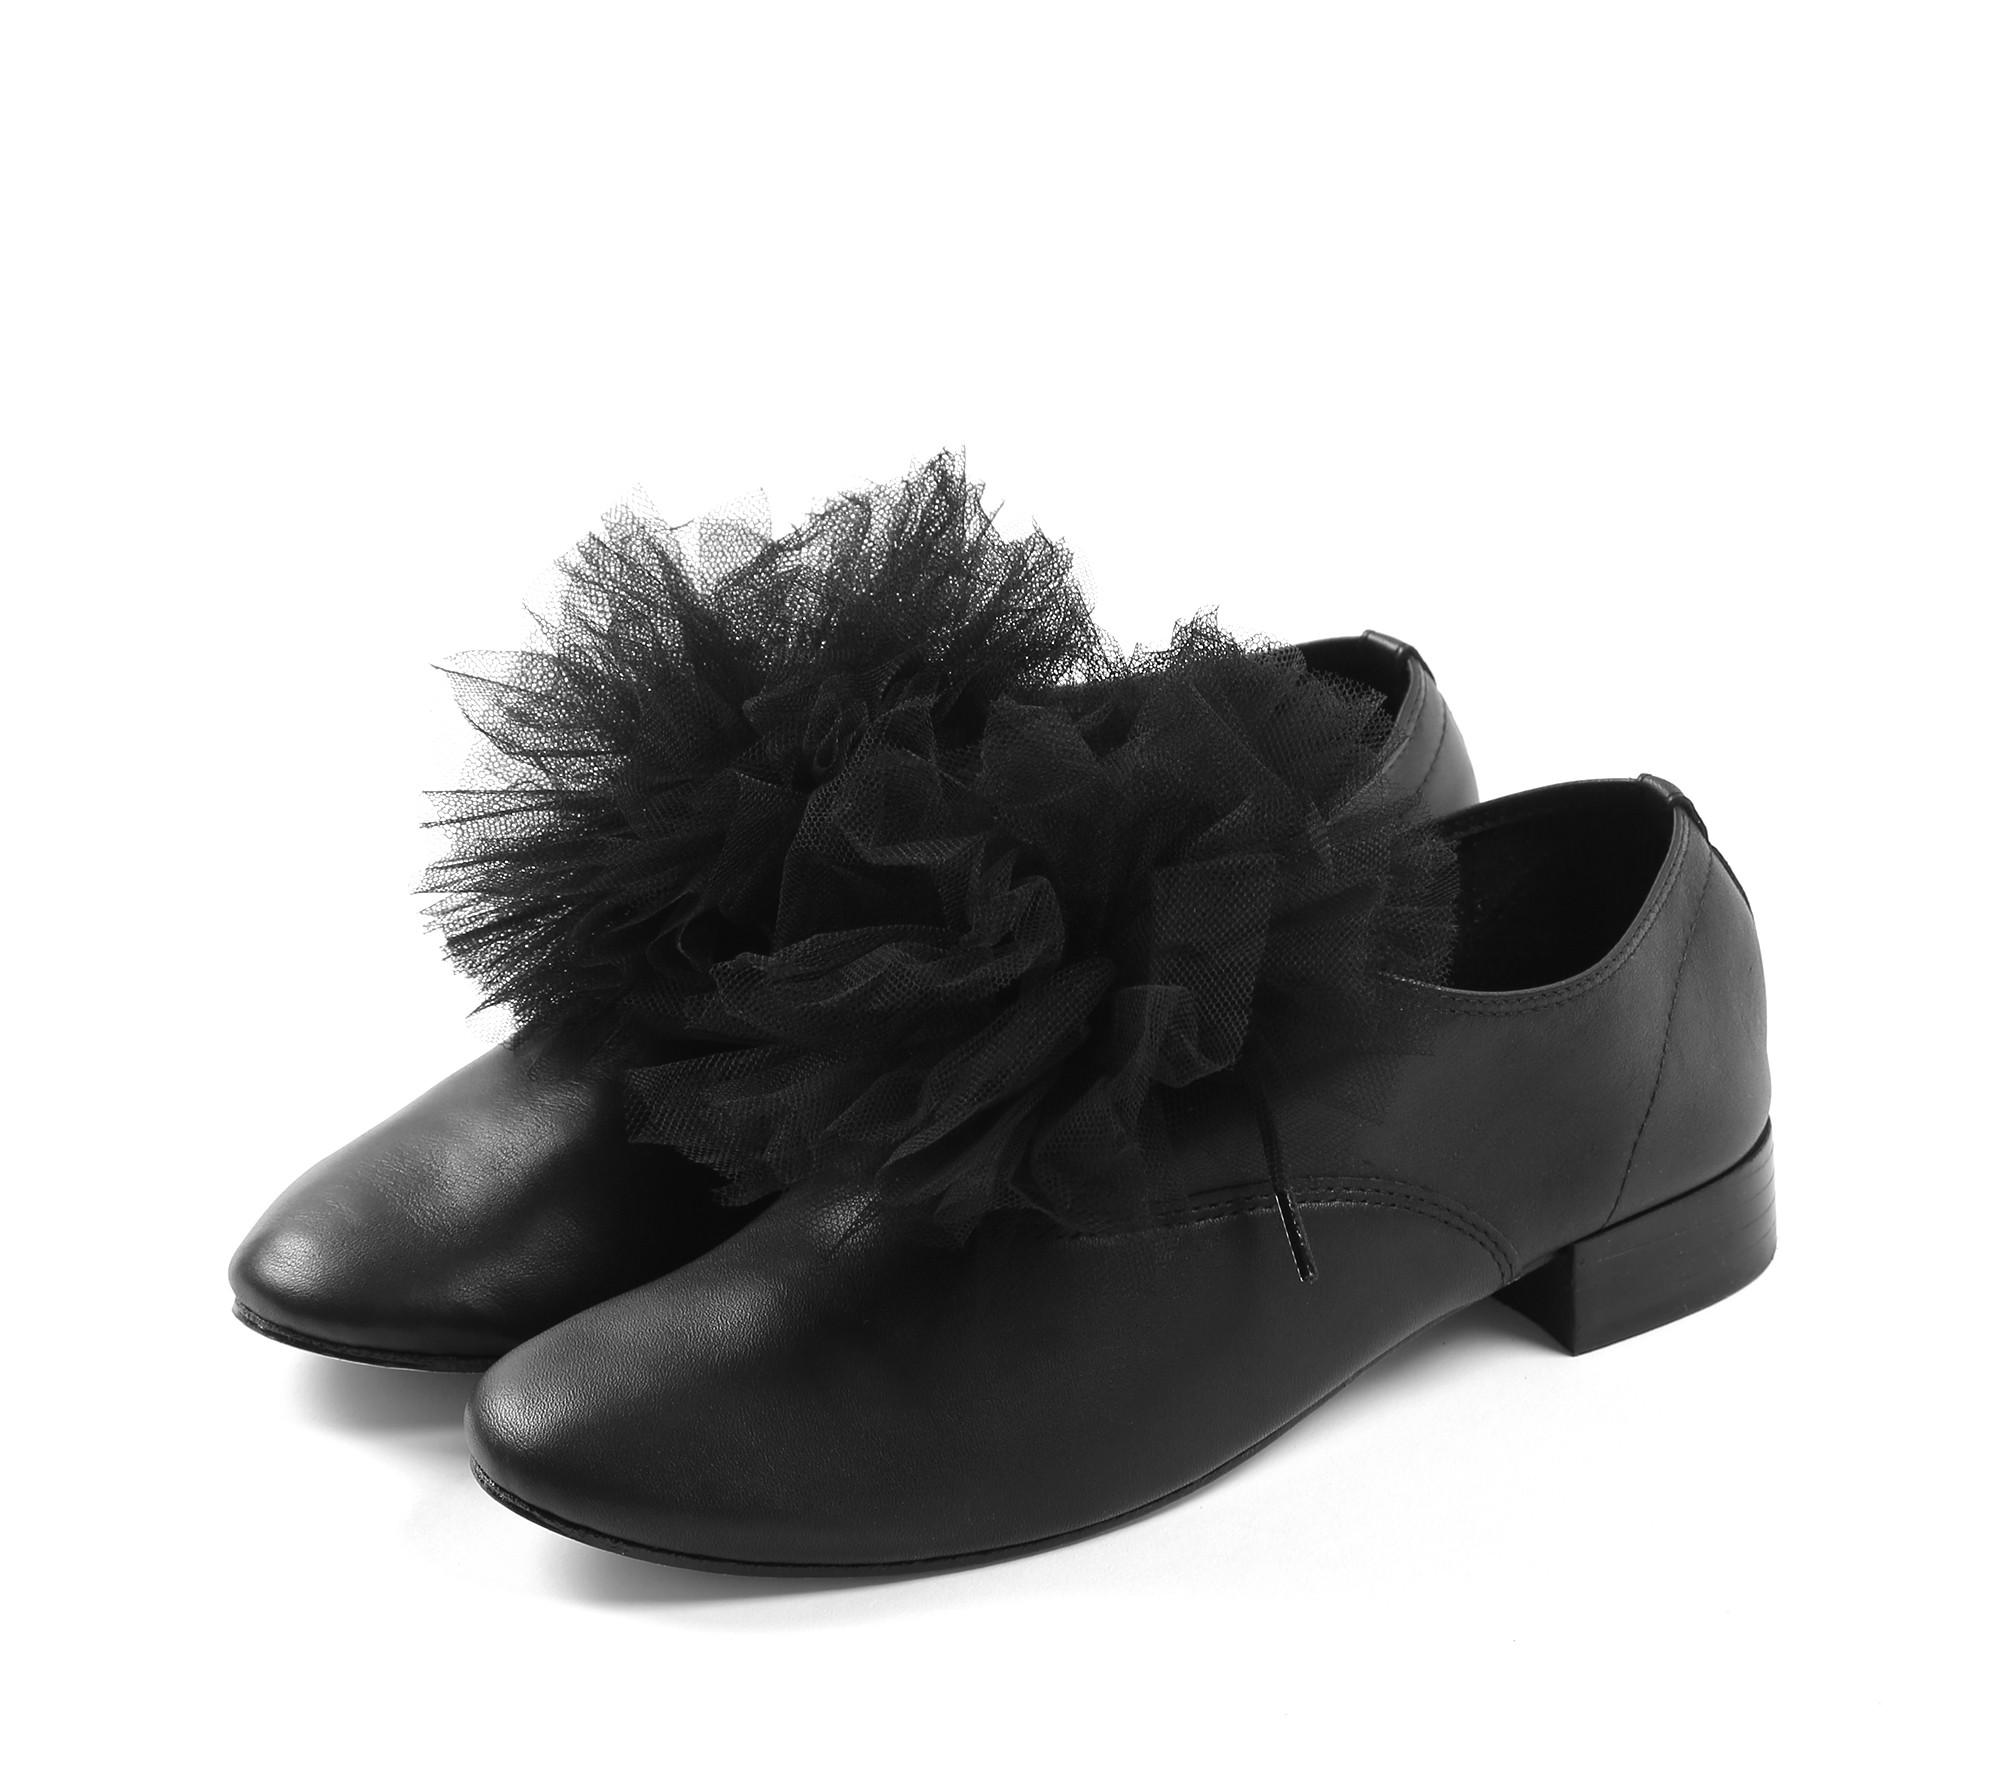 Zizi oxford shoes - Karena Lam